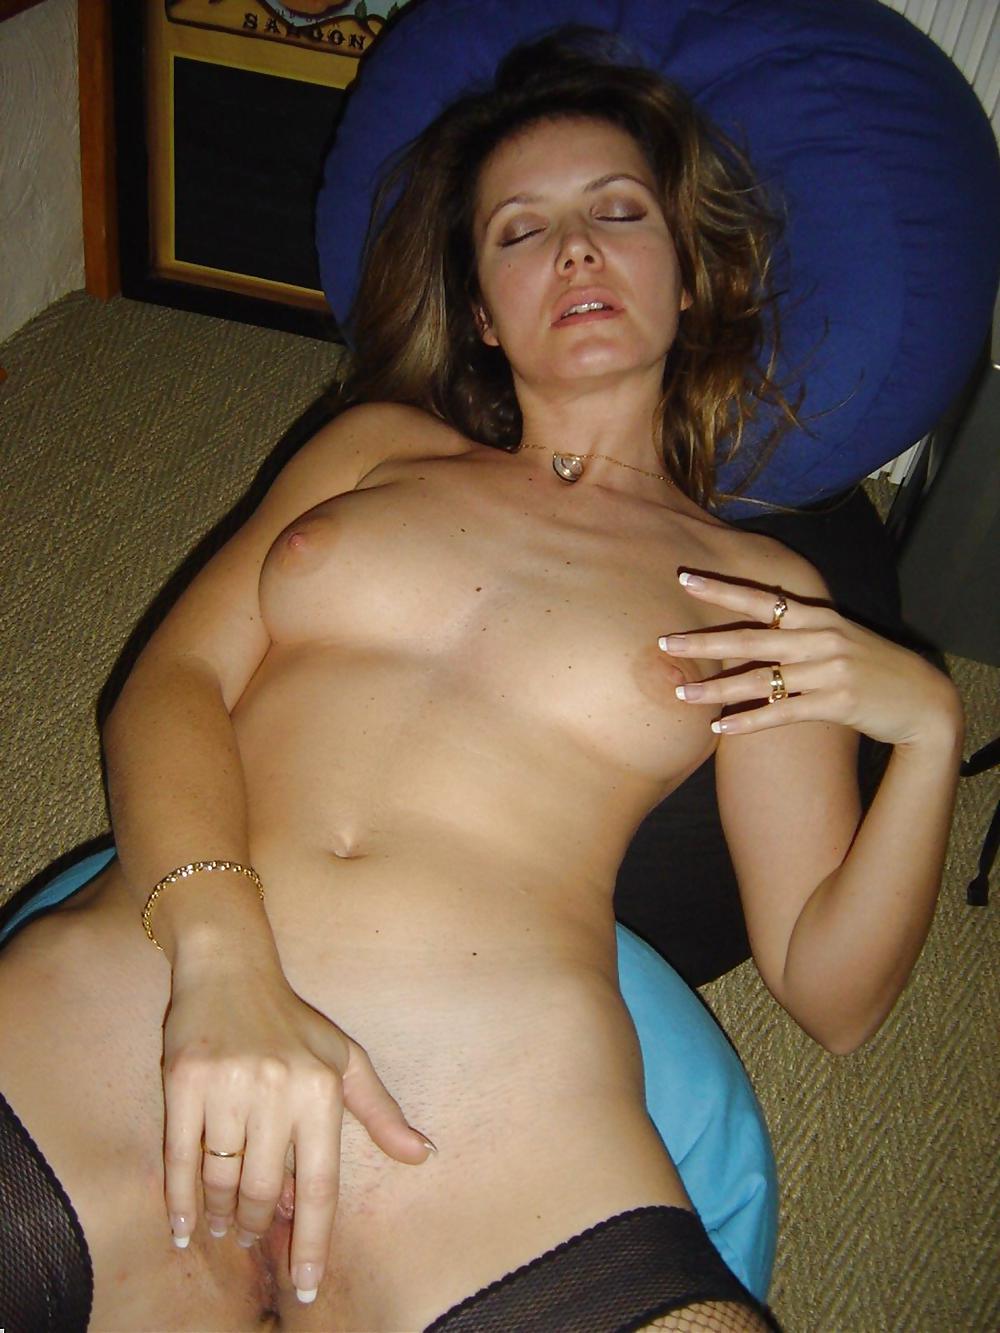 http://hotamateurmature.com/gallery/Housewives_milf_mature_elders/78.jpg